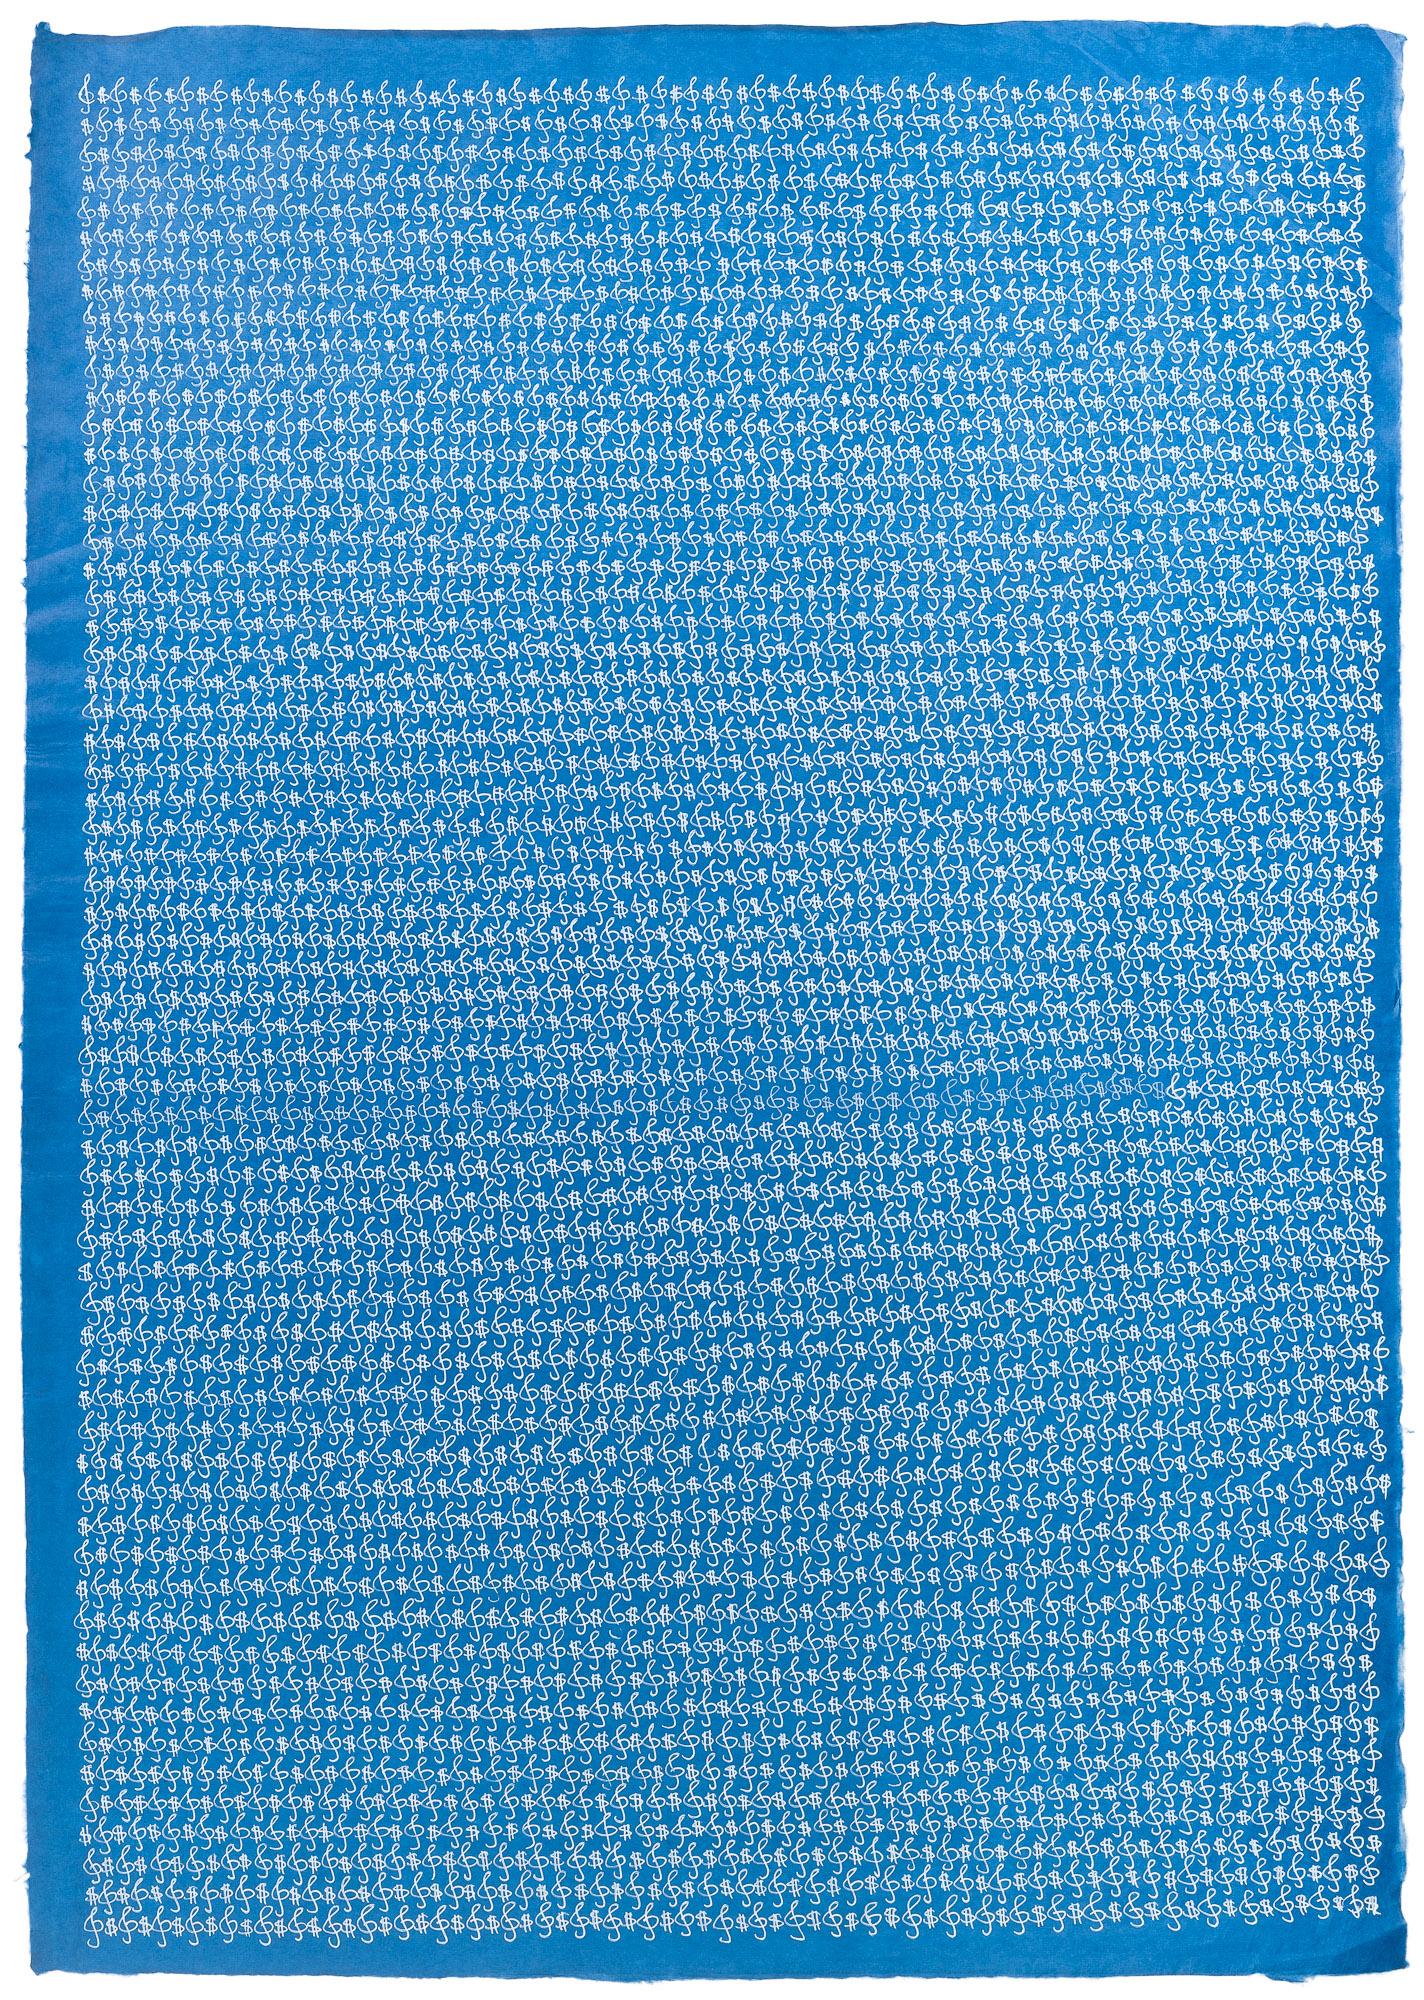 "Ana Prvacki, ""Various keys,"" 2013, Gel pen on Gampi paper, 34.75 x 26.5 inches (framed)"